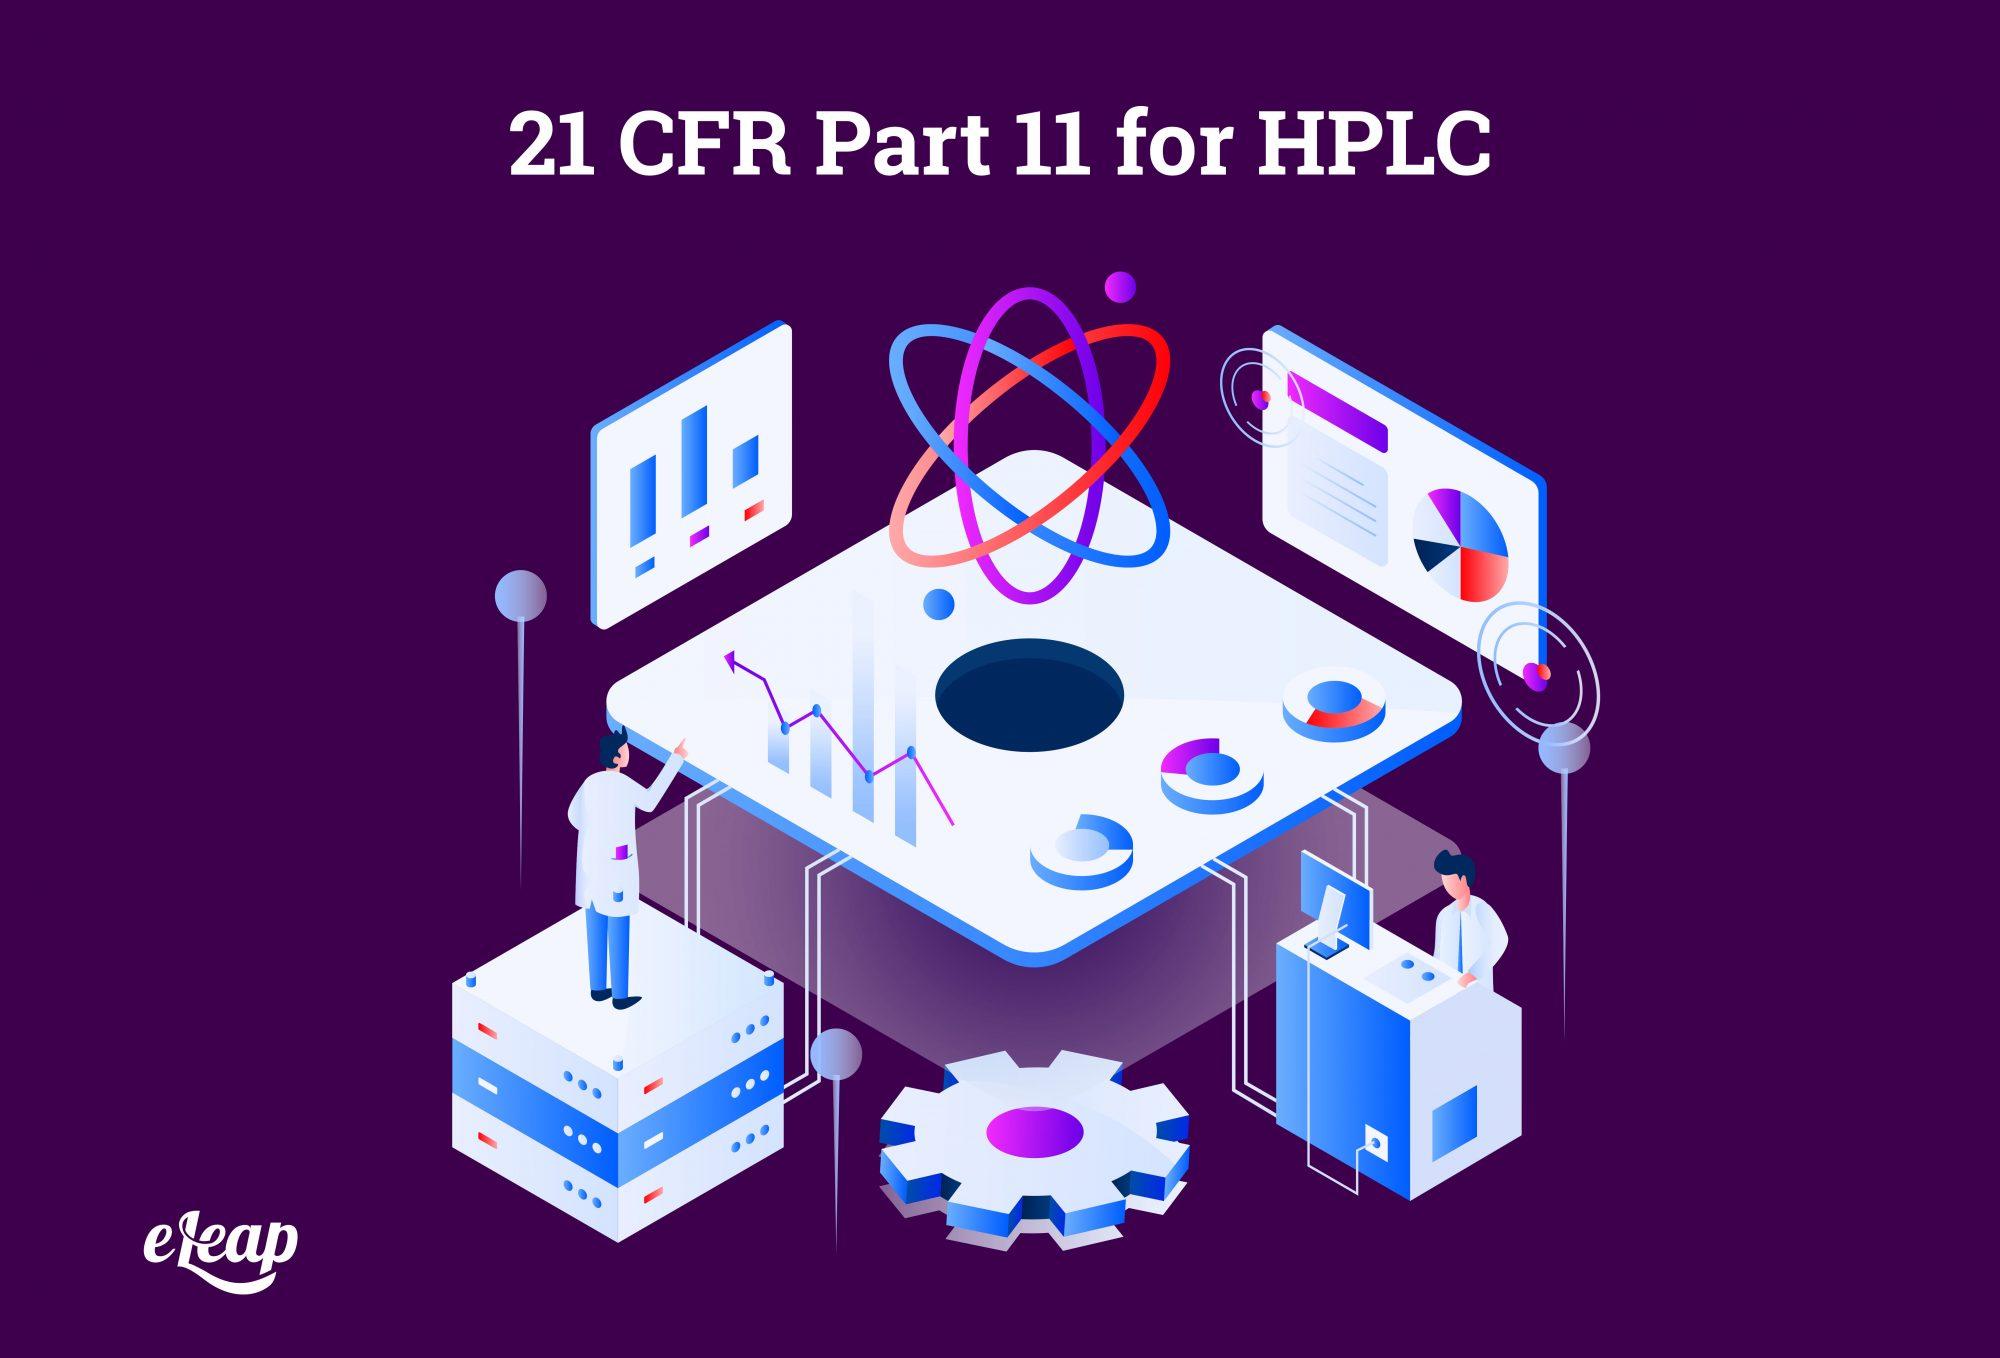 21 CFR Part 11 for HPLC